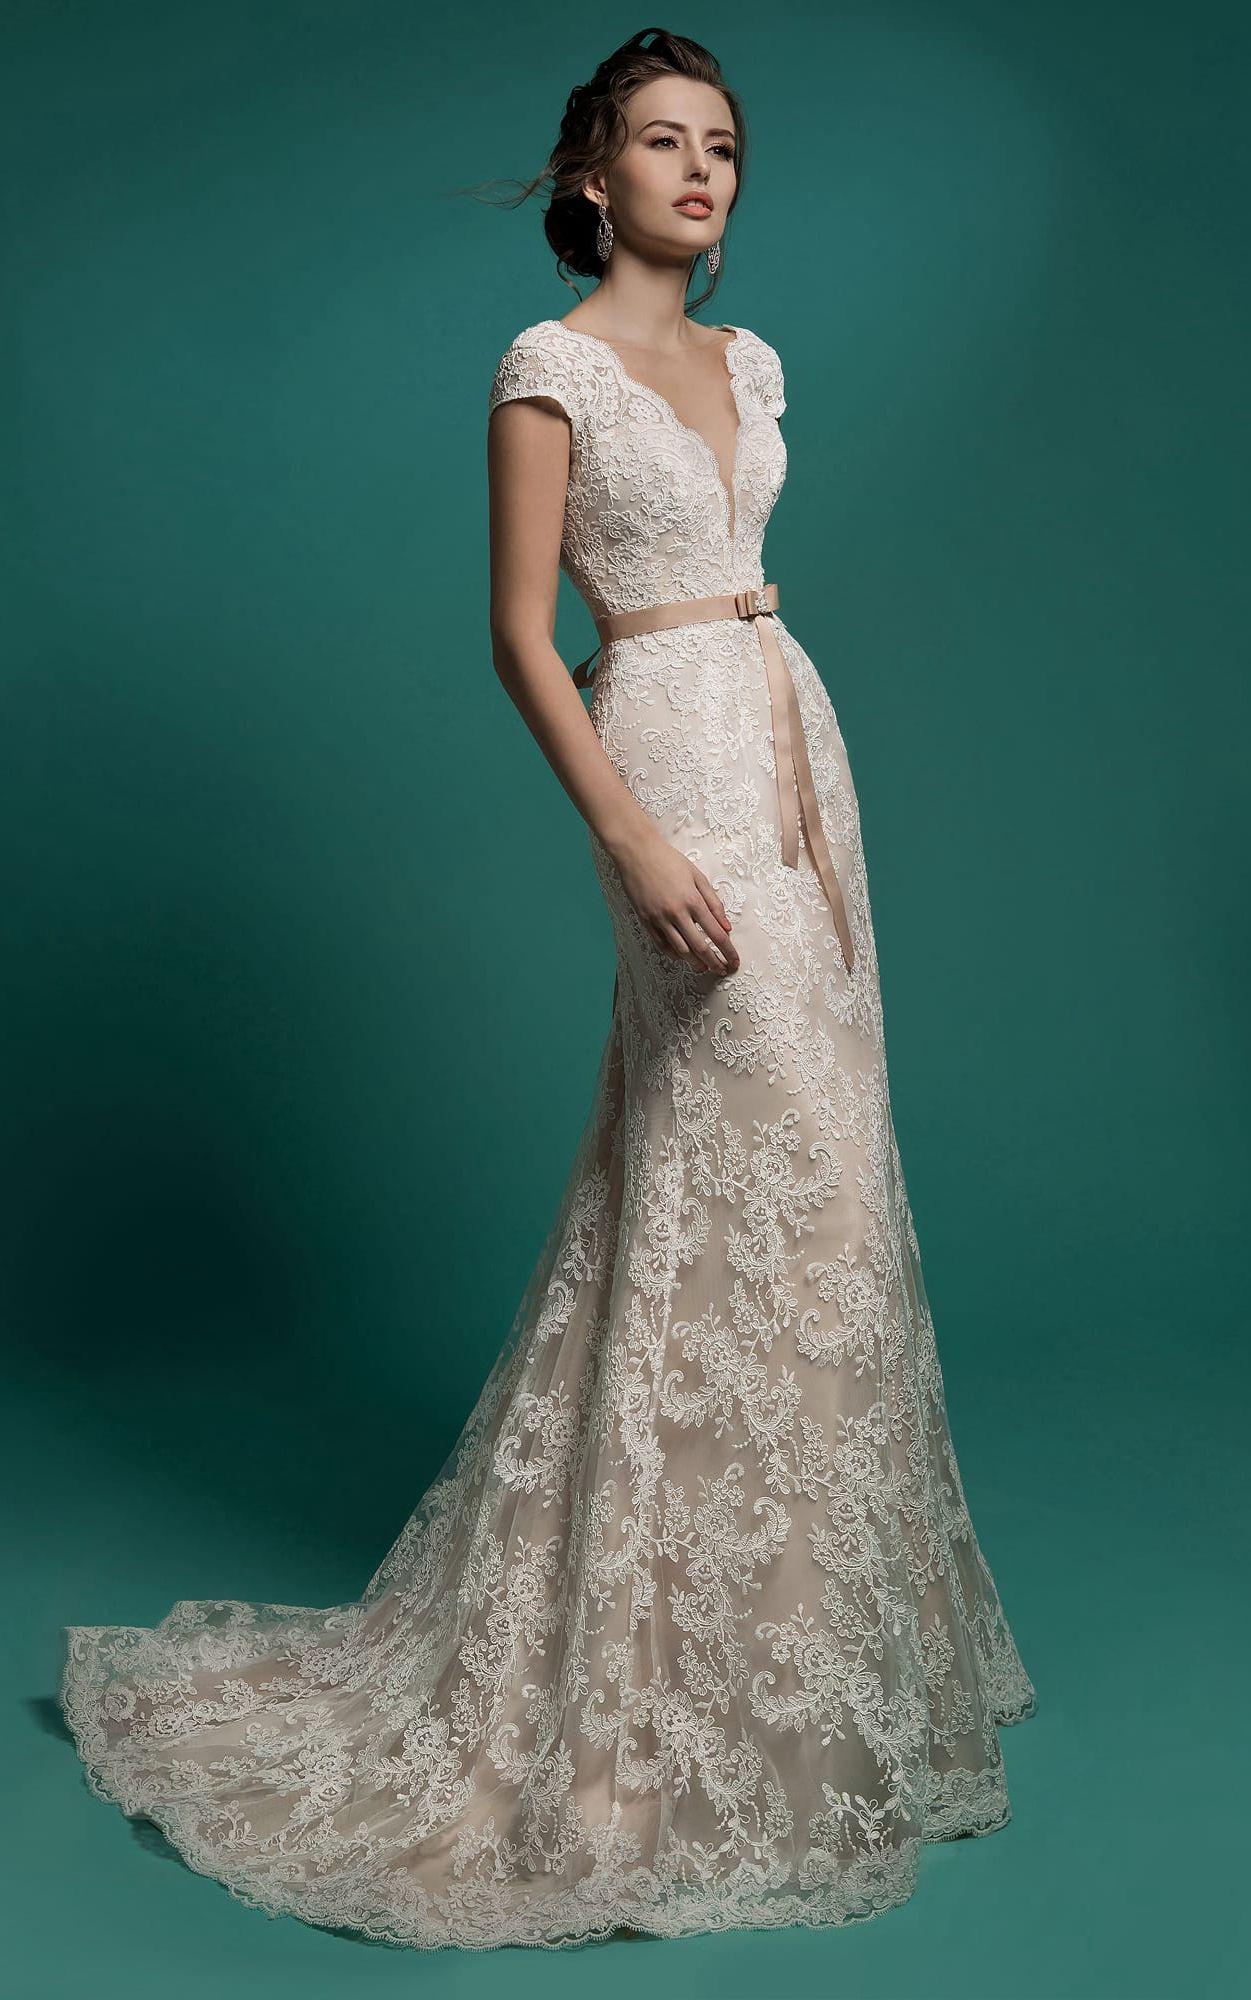 Long sleeve v neck wedding dress  Mermaid FloorLength VNeck CapSleeve Zipper Lace Dress With Sash